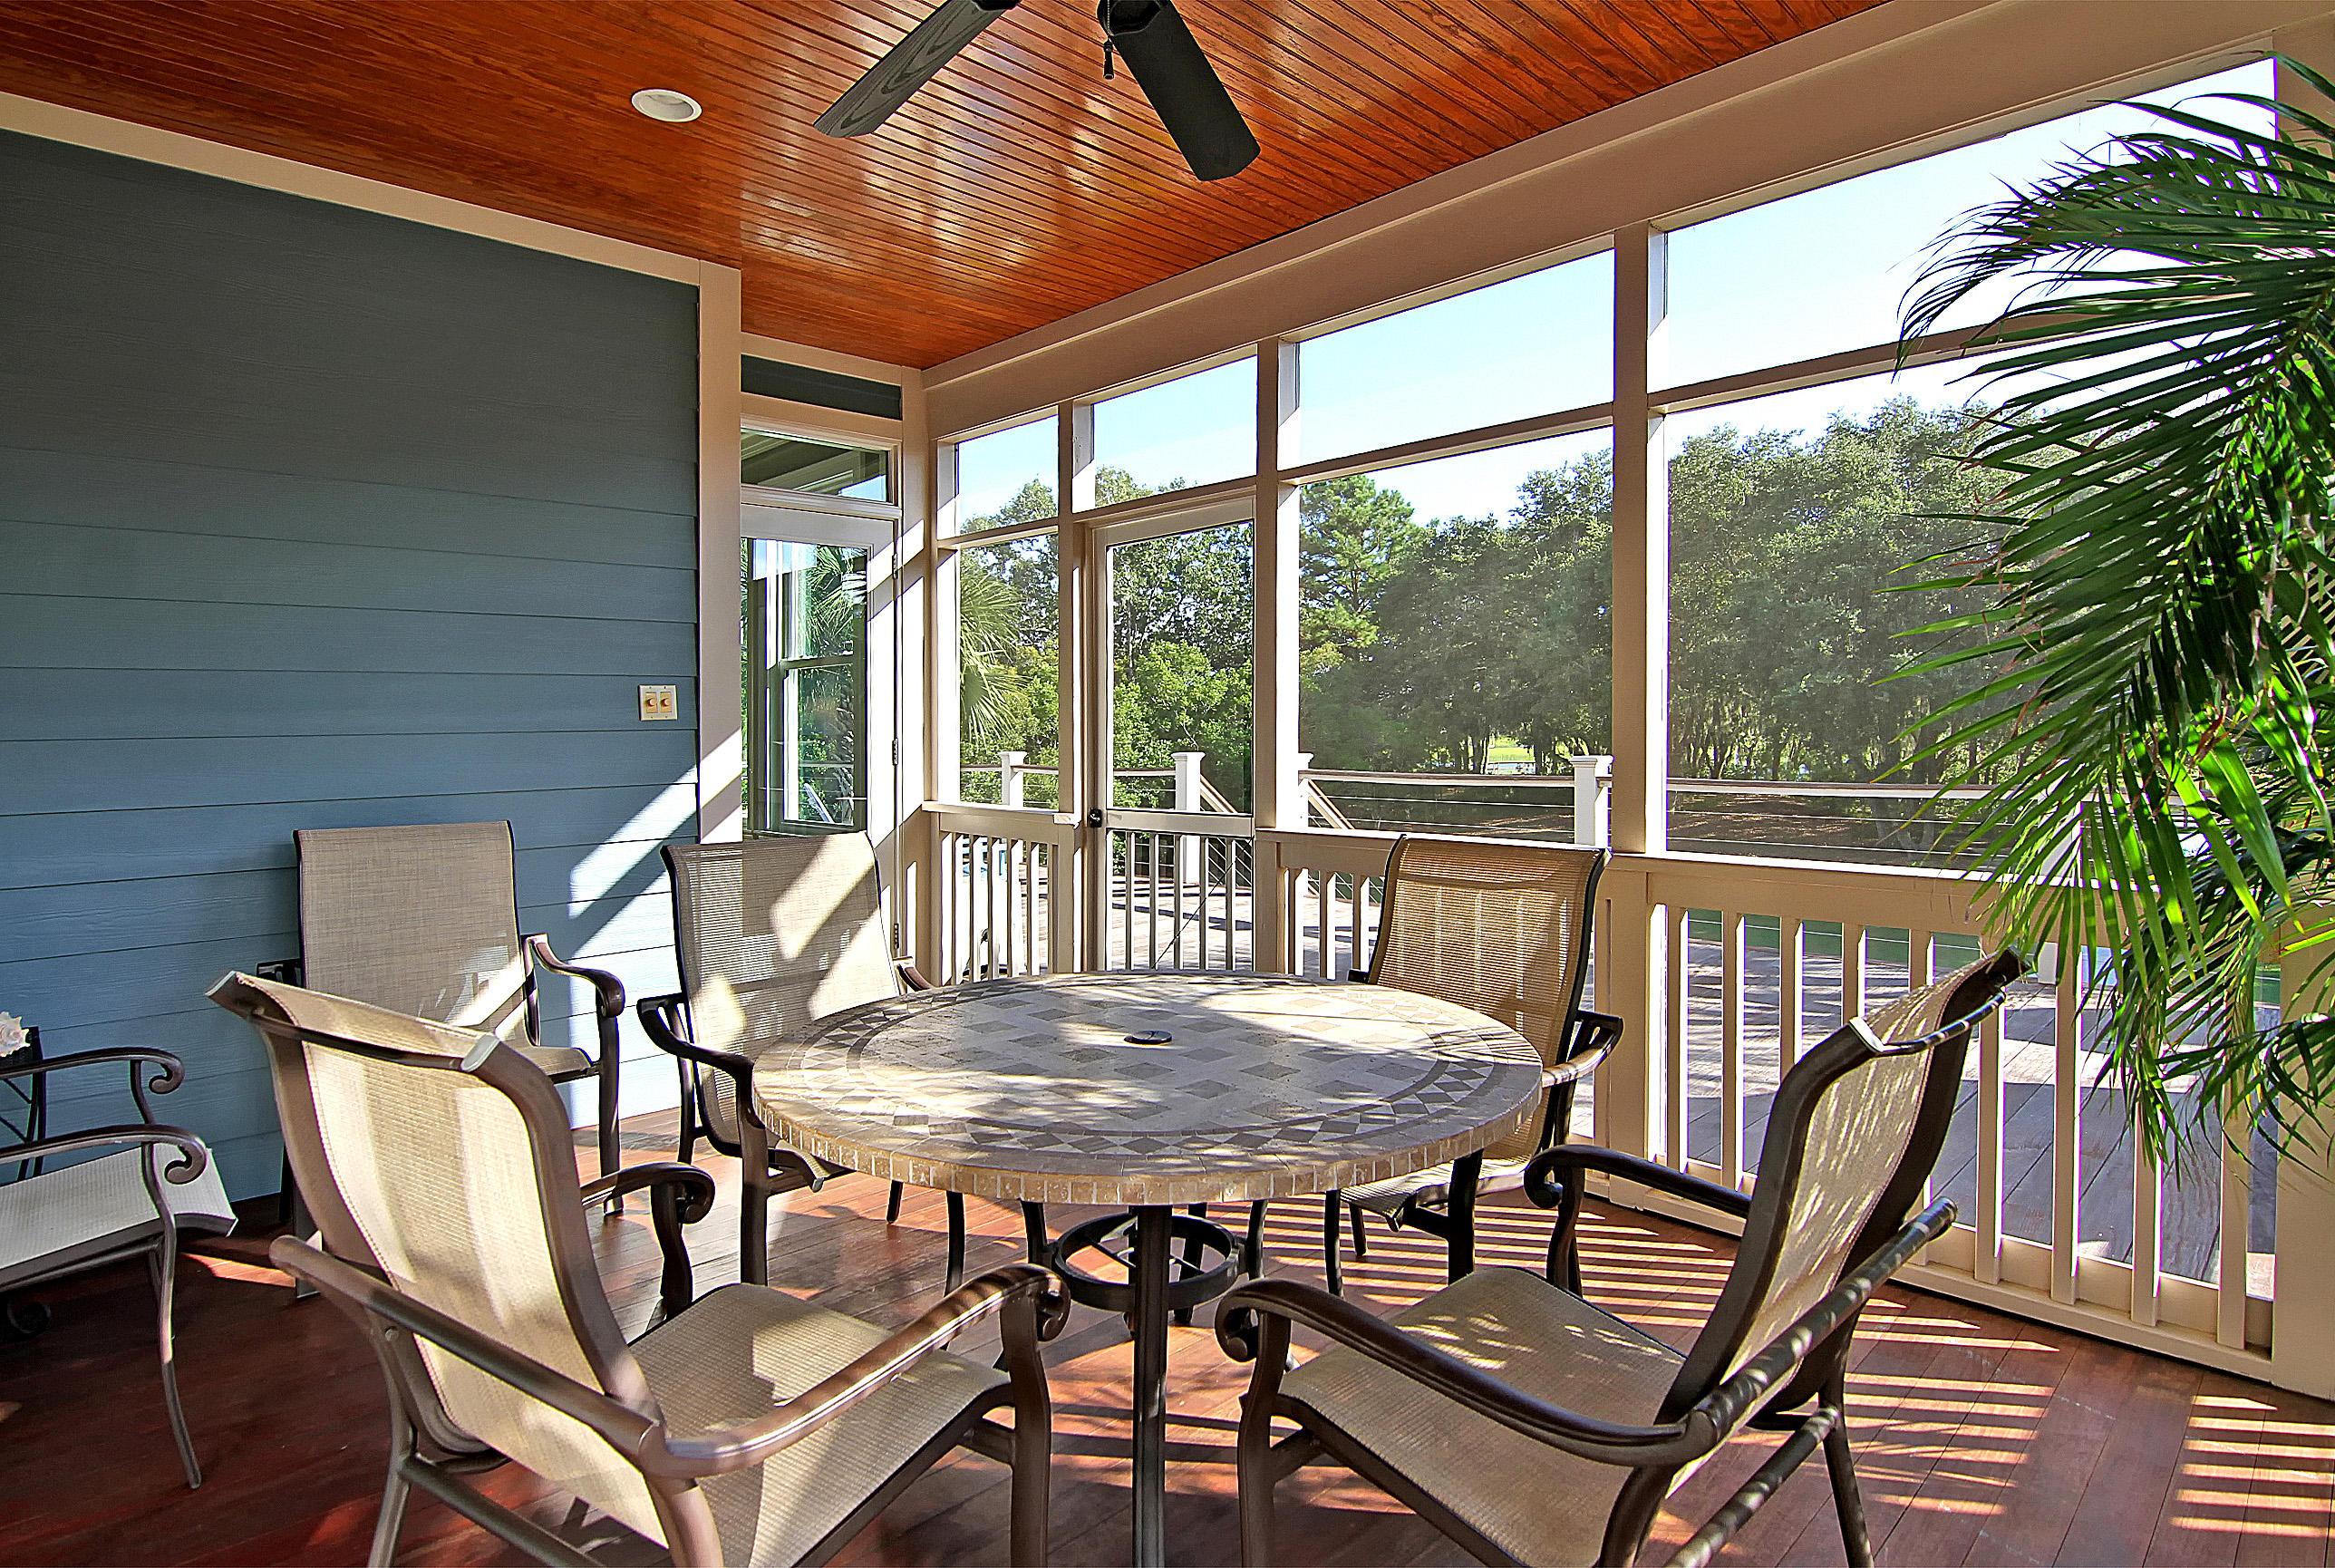 Archfield Plantation Homes For Sale - 4655 Archfield, Meggett, SC - 46